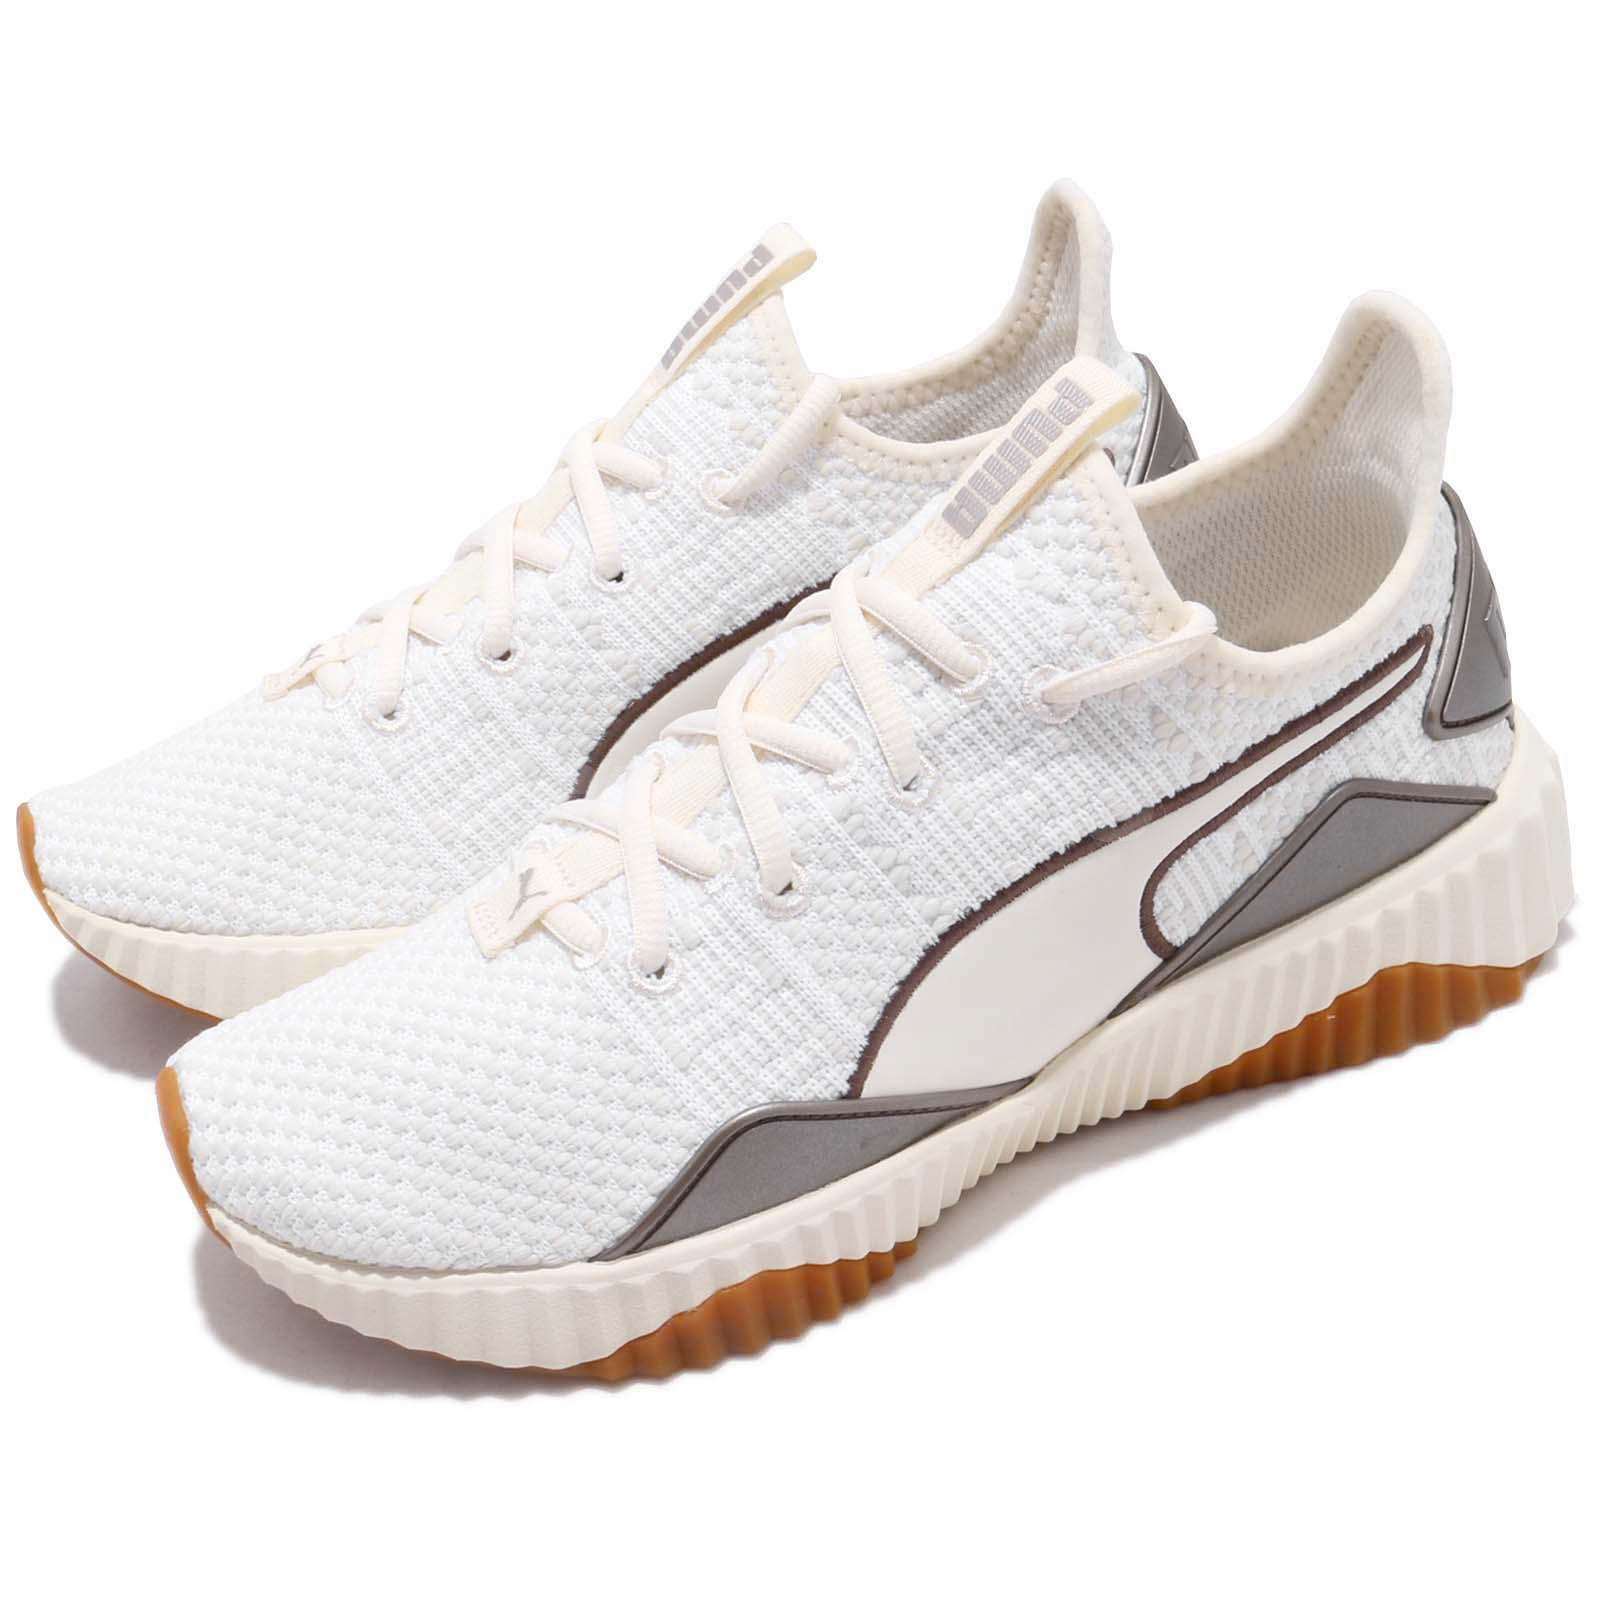 Puma Defy Luxe Wns White Ivory Gum